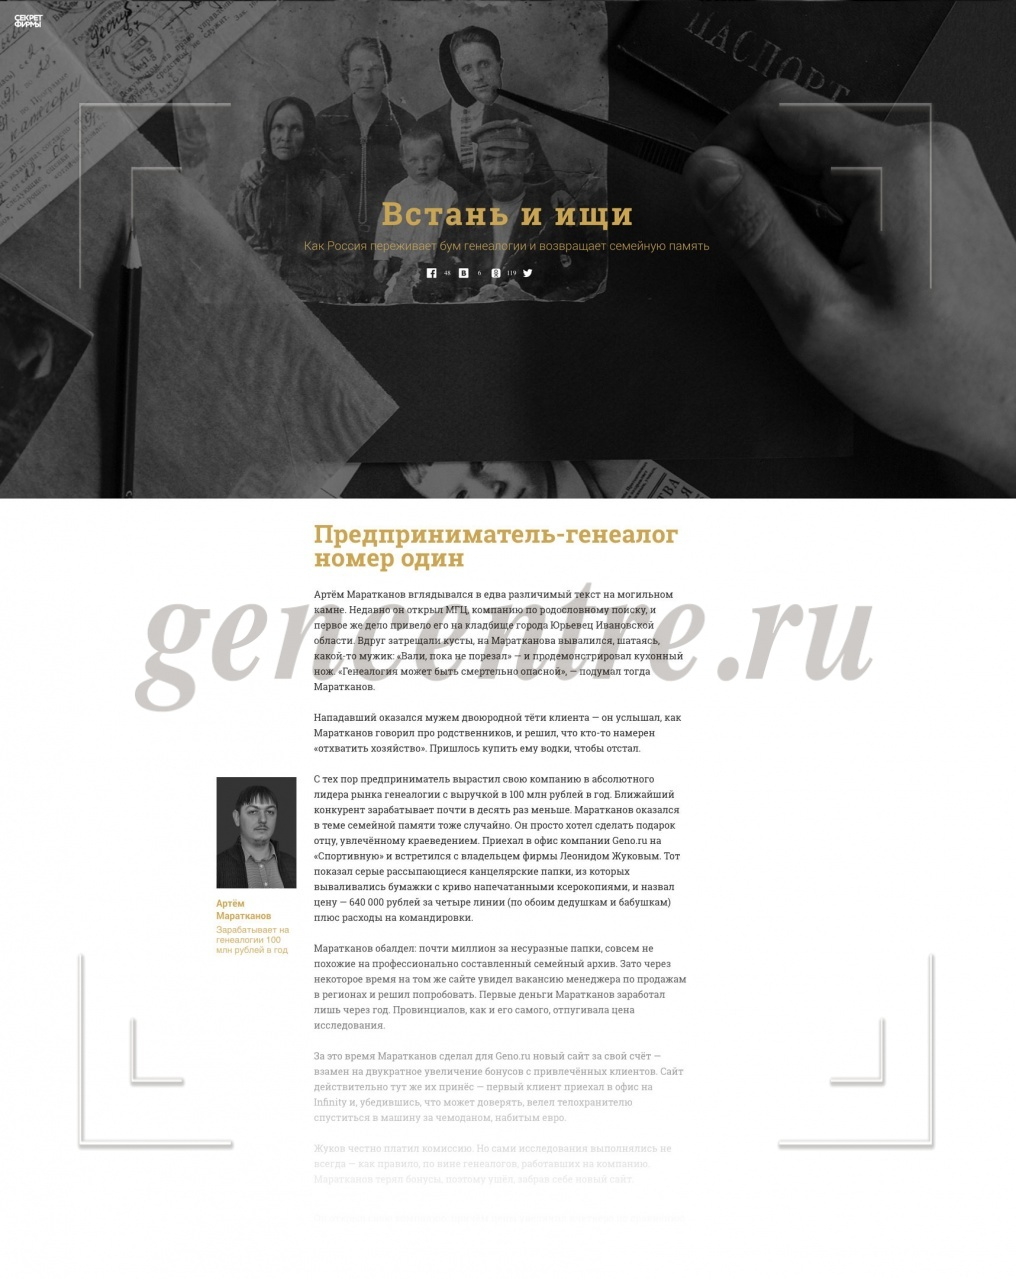 Генеалог номер один в СНГ— Артем Маратканов